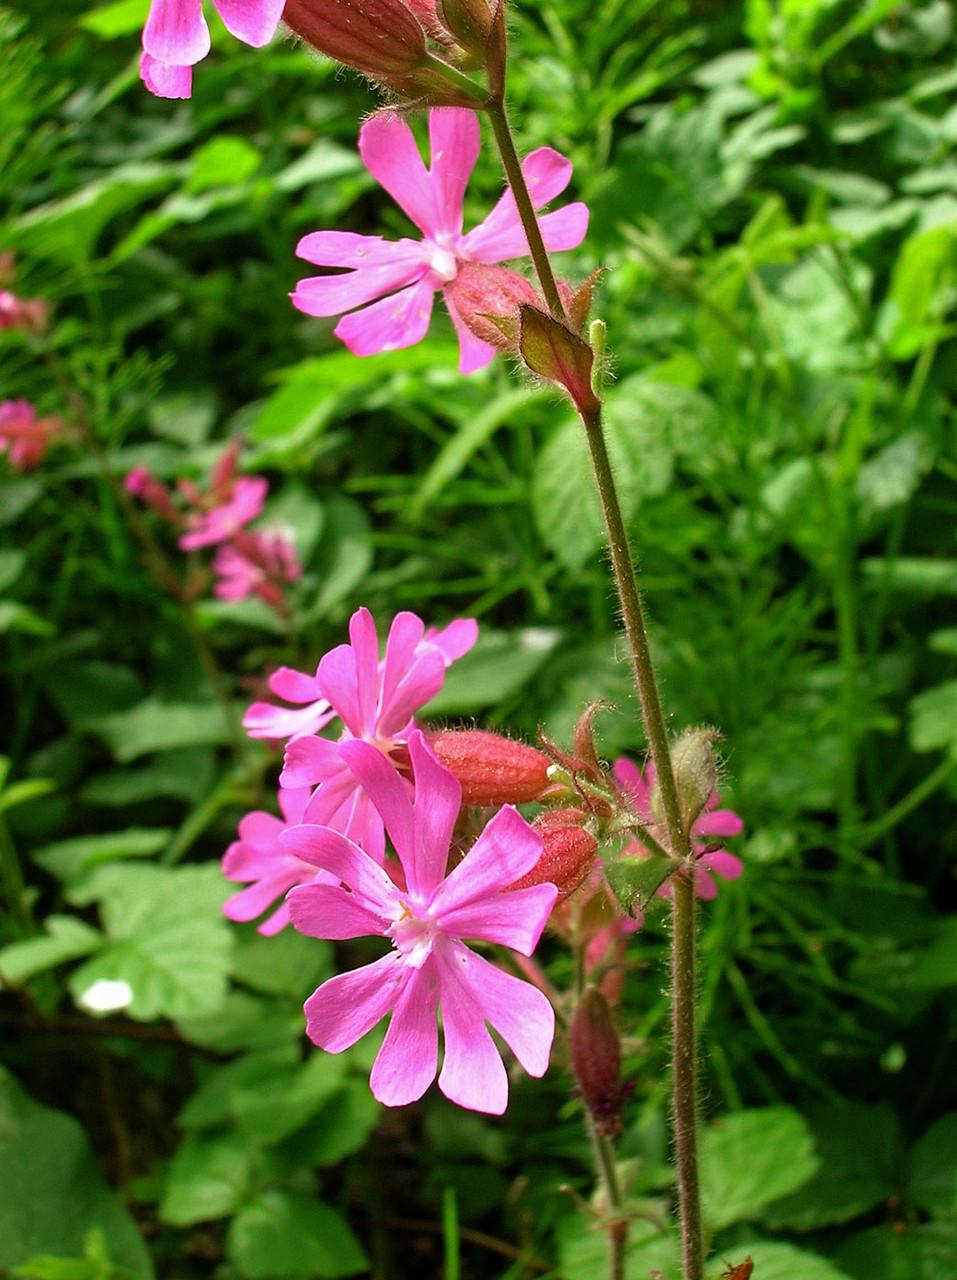 Rote Lichtnelke (Silene dioica) | NELKENGEWÄCHSE (Caryophyllaceae)